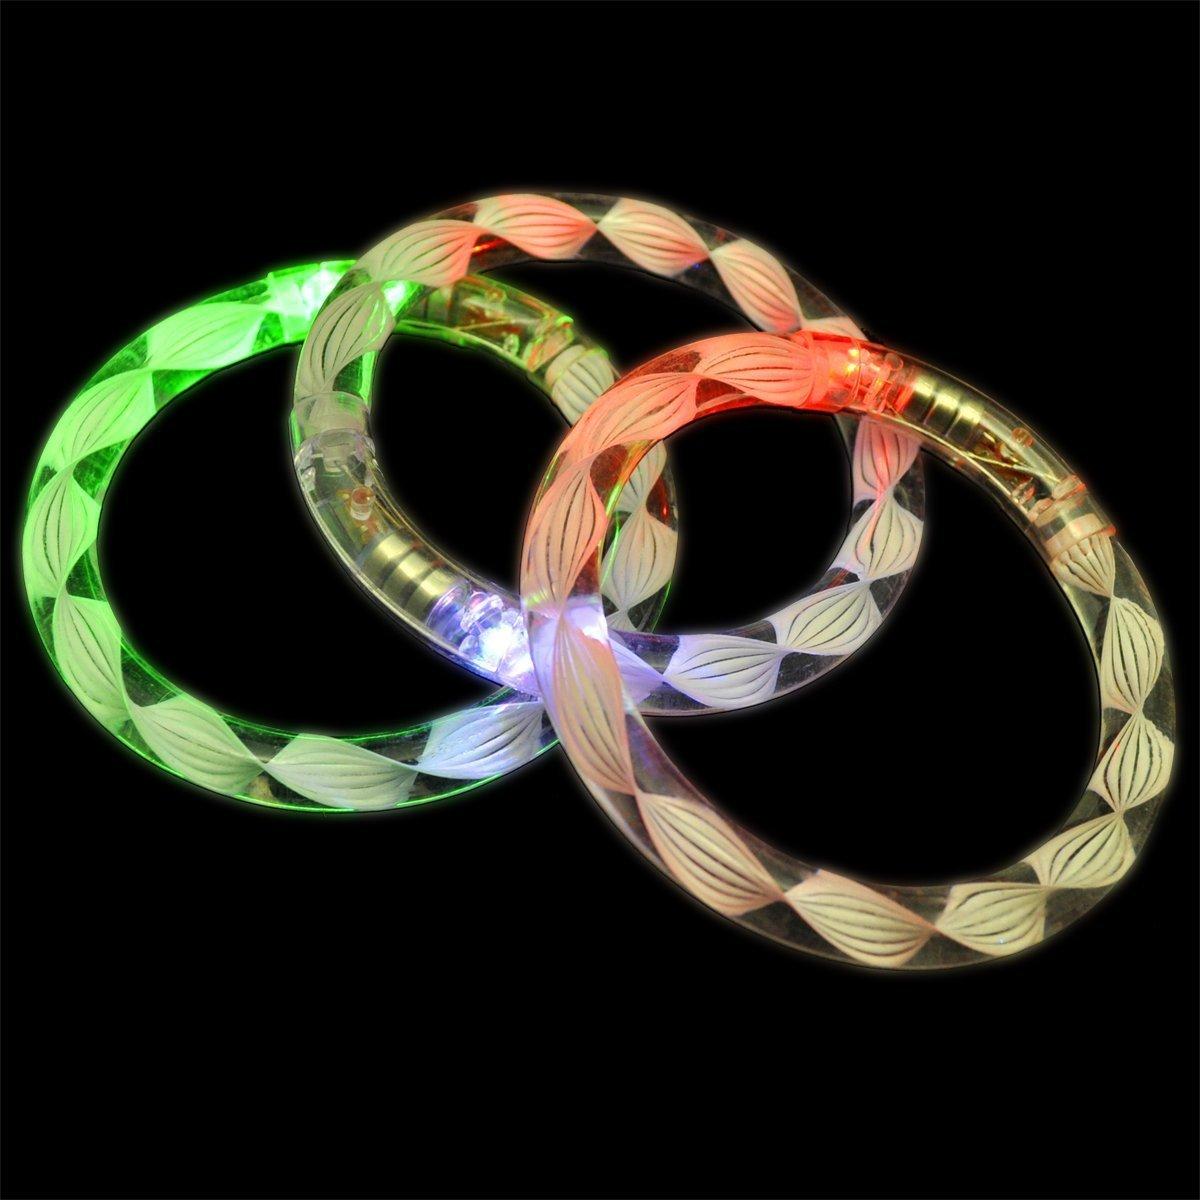 led-rainbow-bracelet-spiral-bangle-flashing-glow-in-a-dark-light-up-bracelet-flashing-blinky-lightfluorescence-stick-electronic-led-light-emiting-braceletkids-party-weddingpartyfavors.jpg